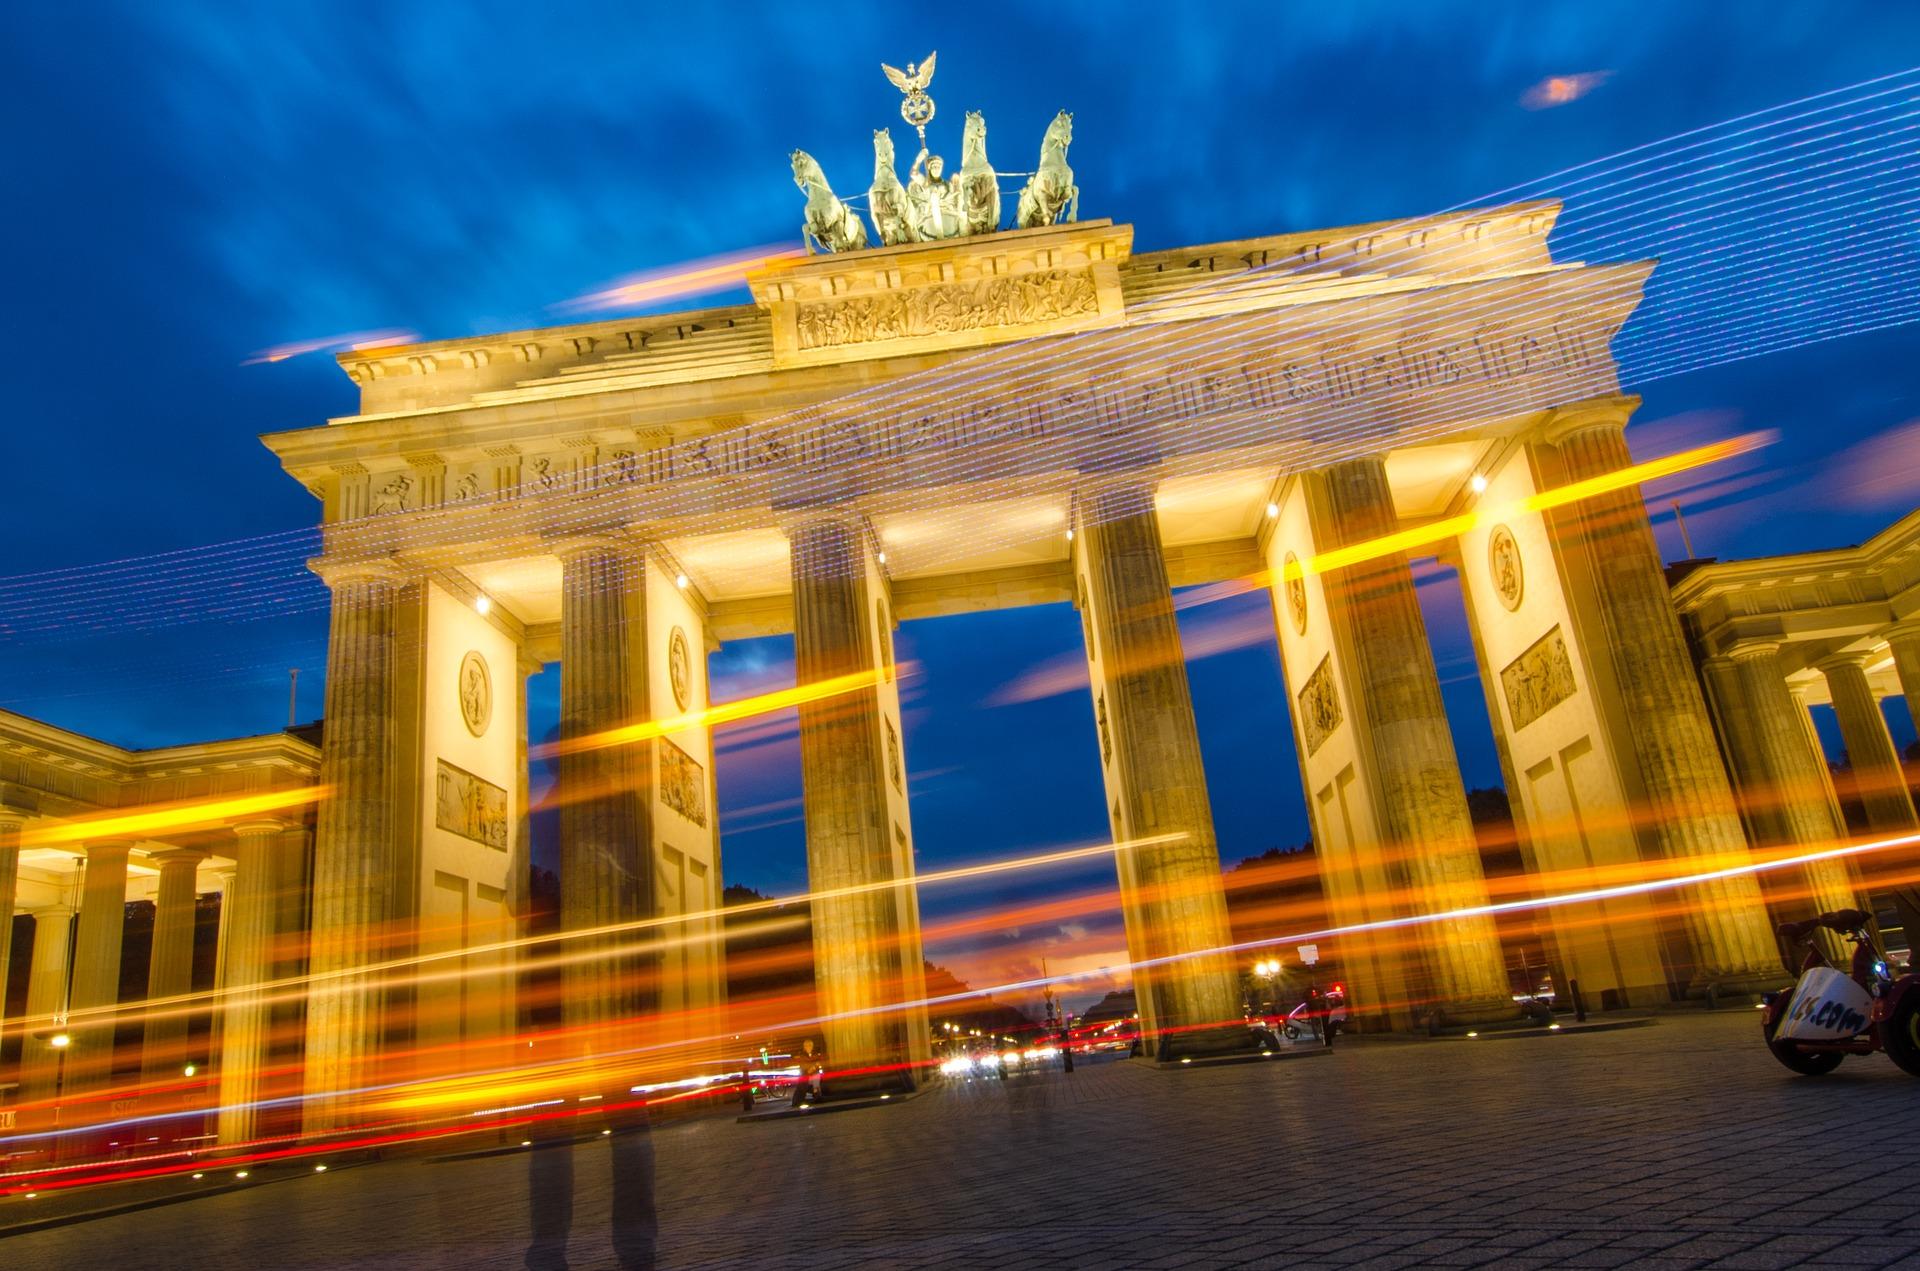 Alexanderplatz Berlin Köln nach Berlin Flug & Hotel ab 90,00€ - eine Woche Berlin ab 202,00€